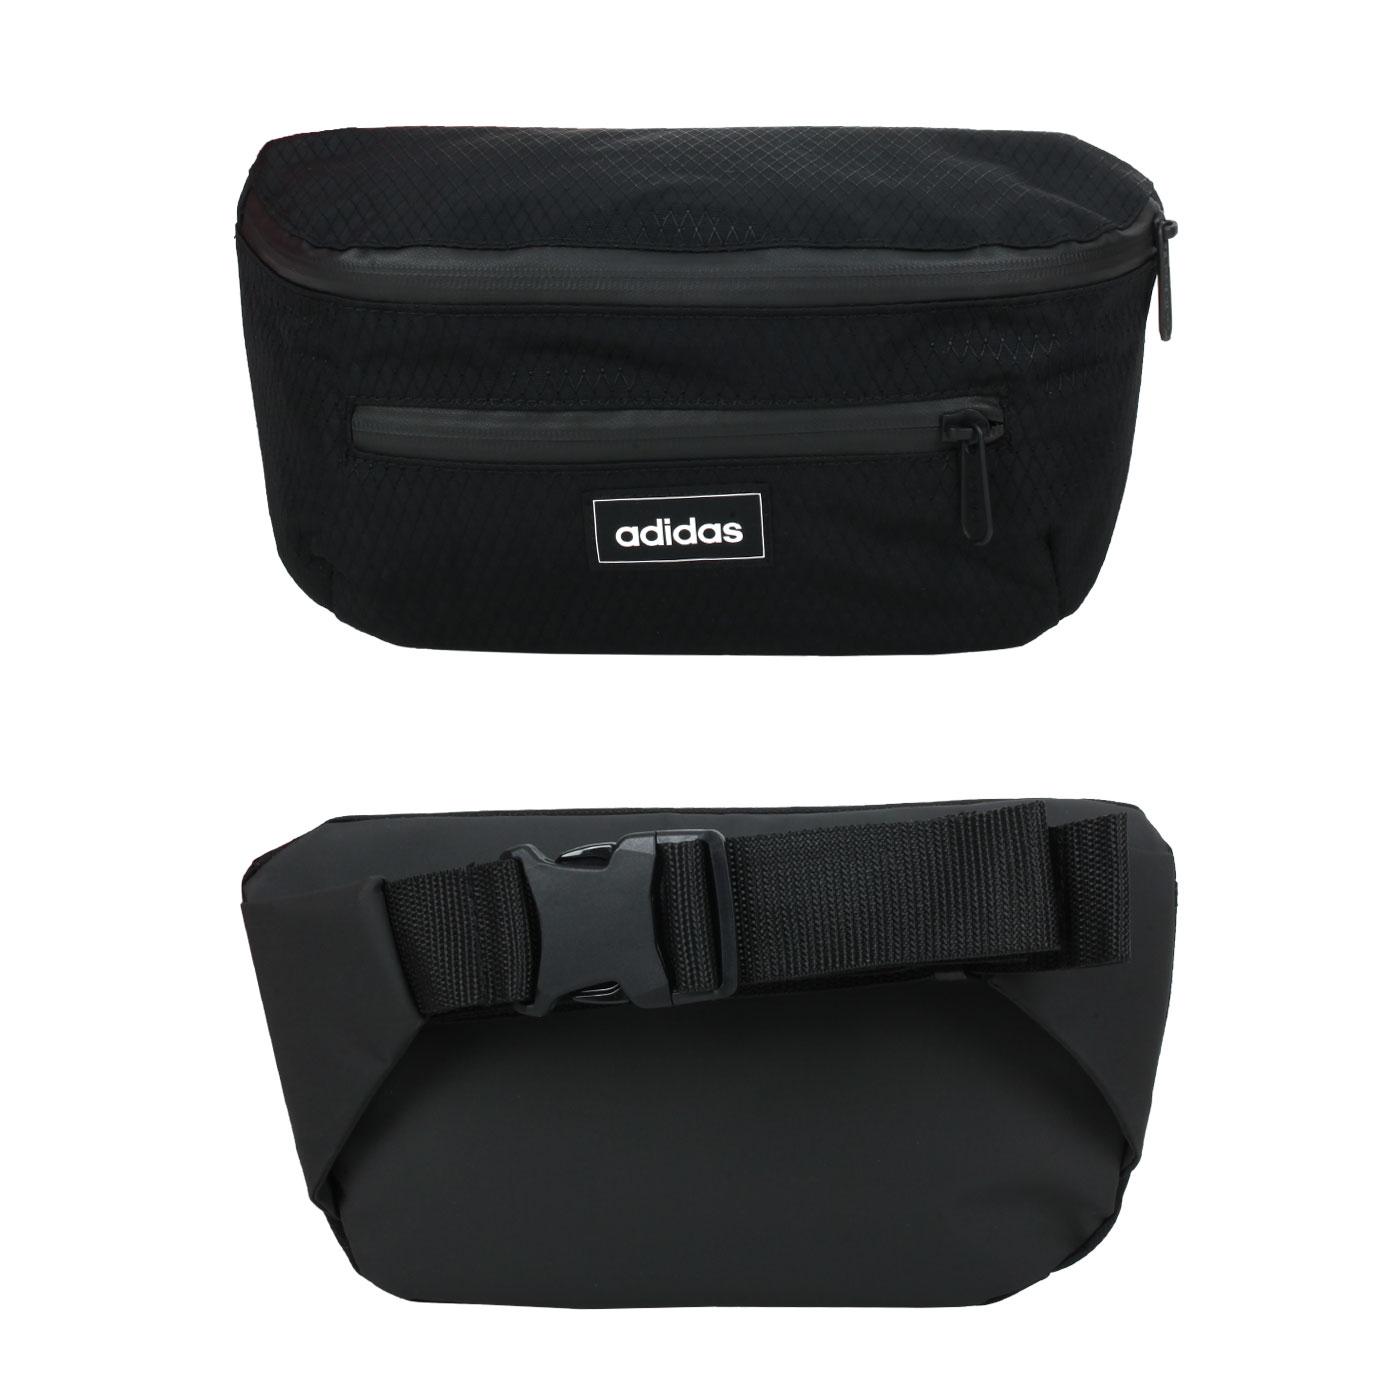 ADIDAS 小型腰包 GN2051 - 黑白